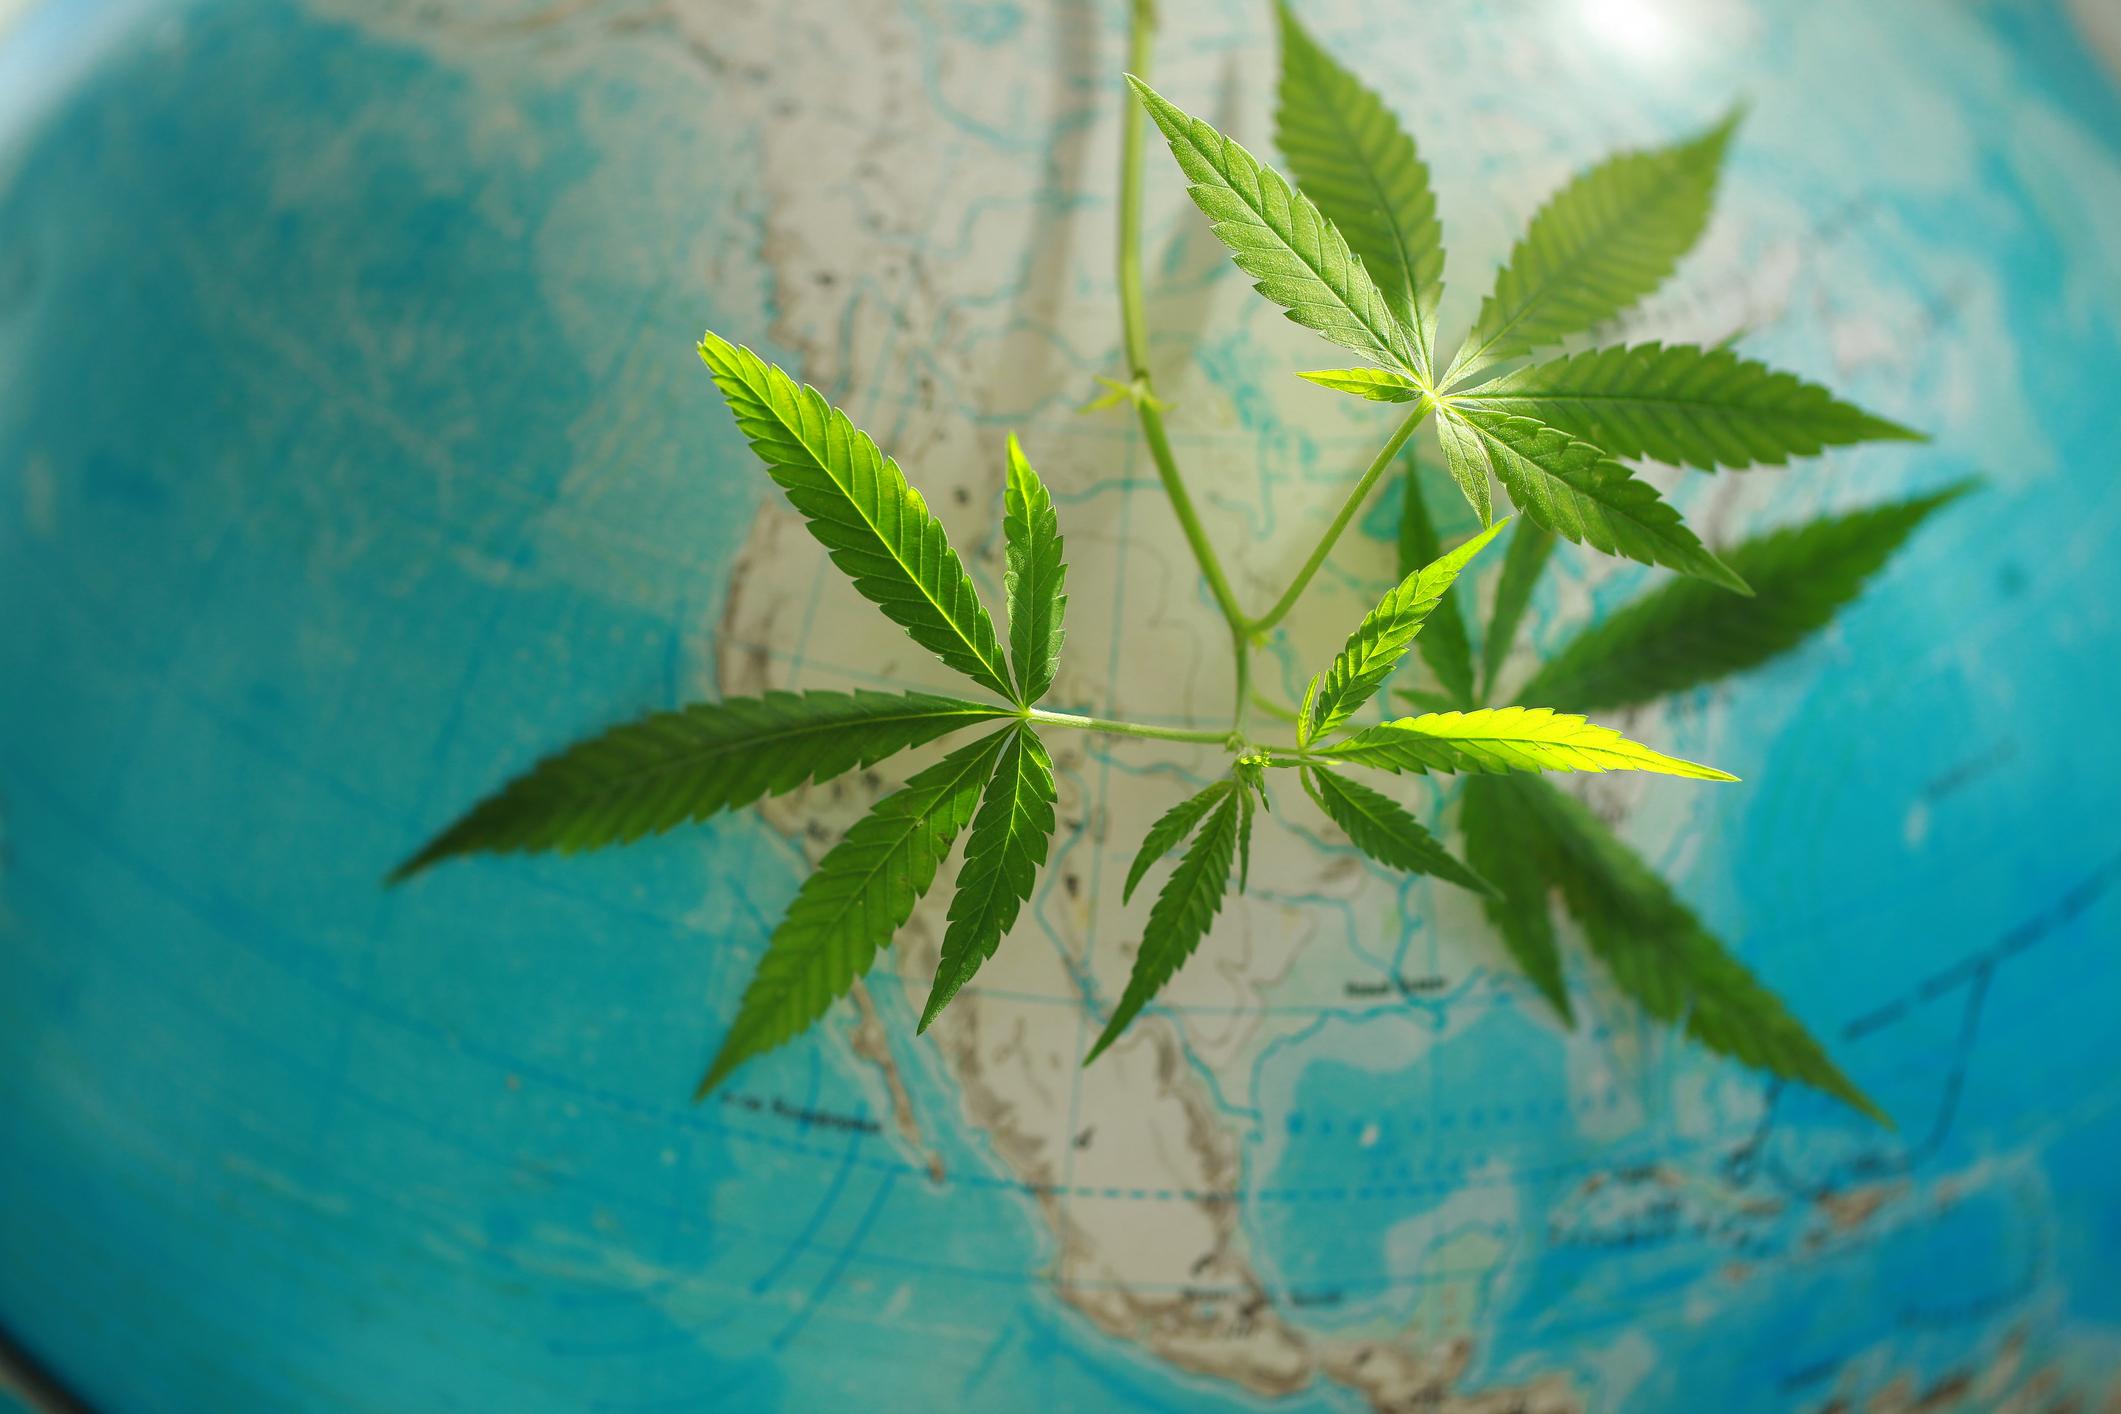 Marijuana plant draping over a globe showing North America.